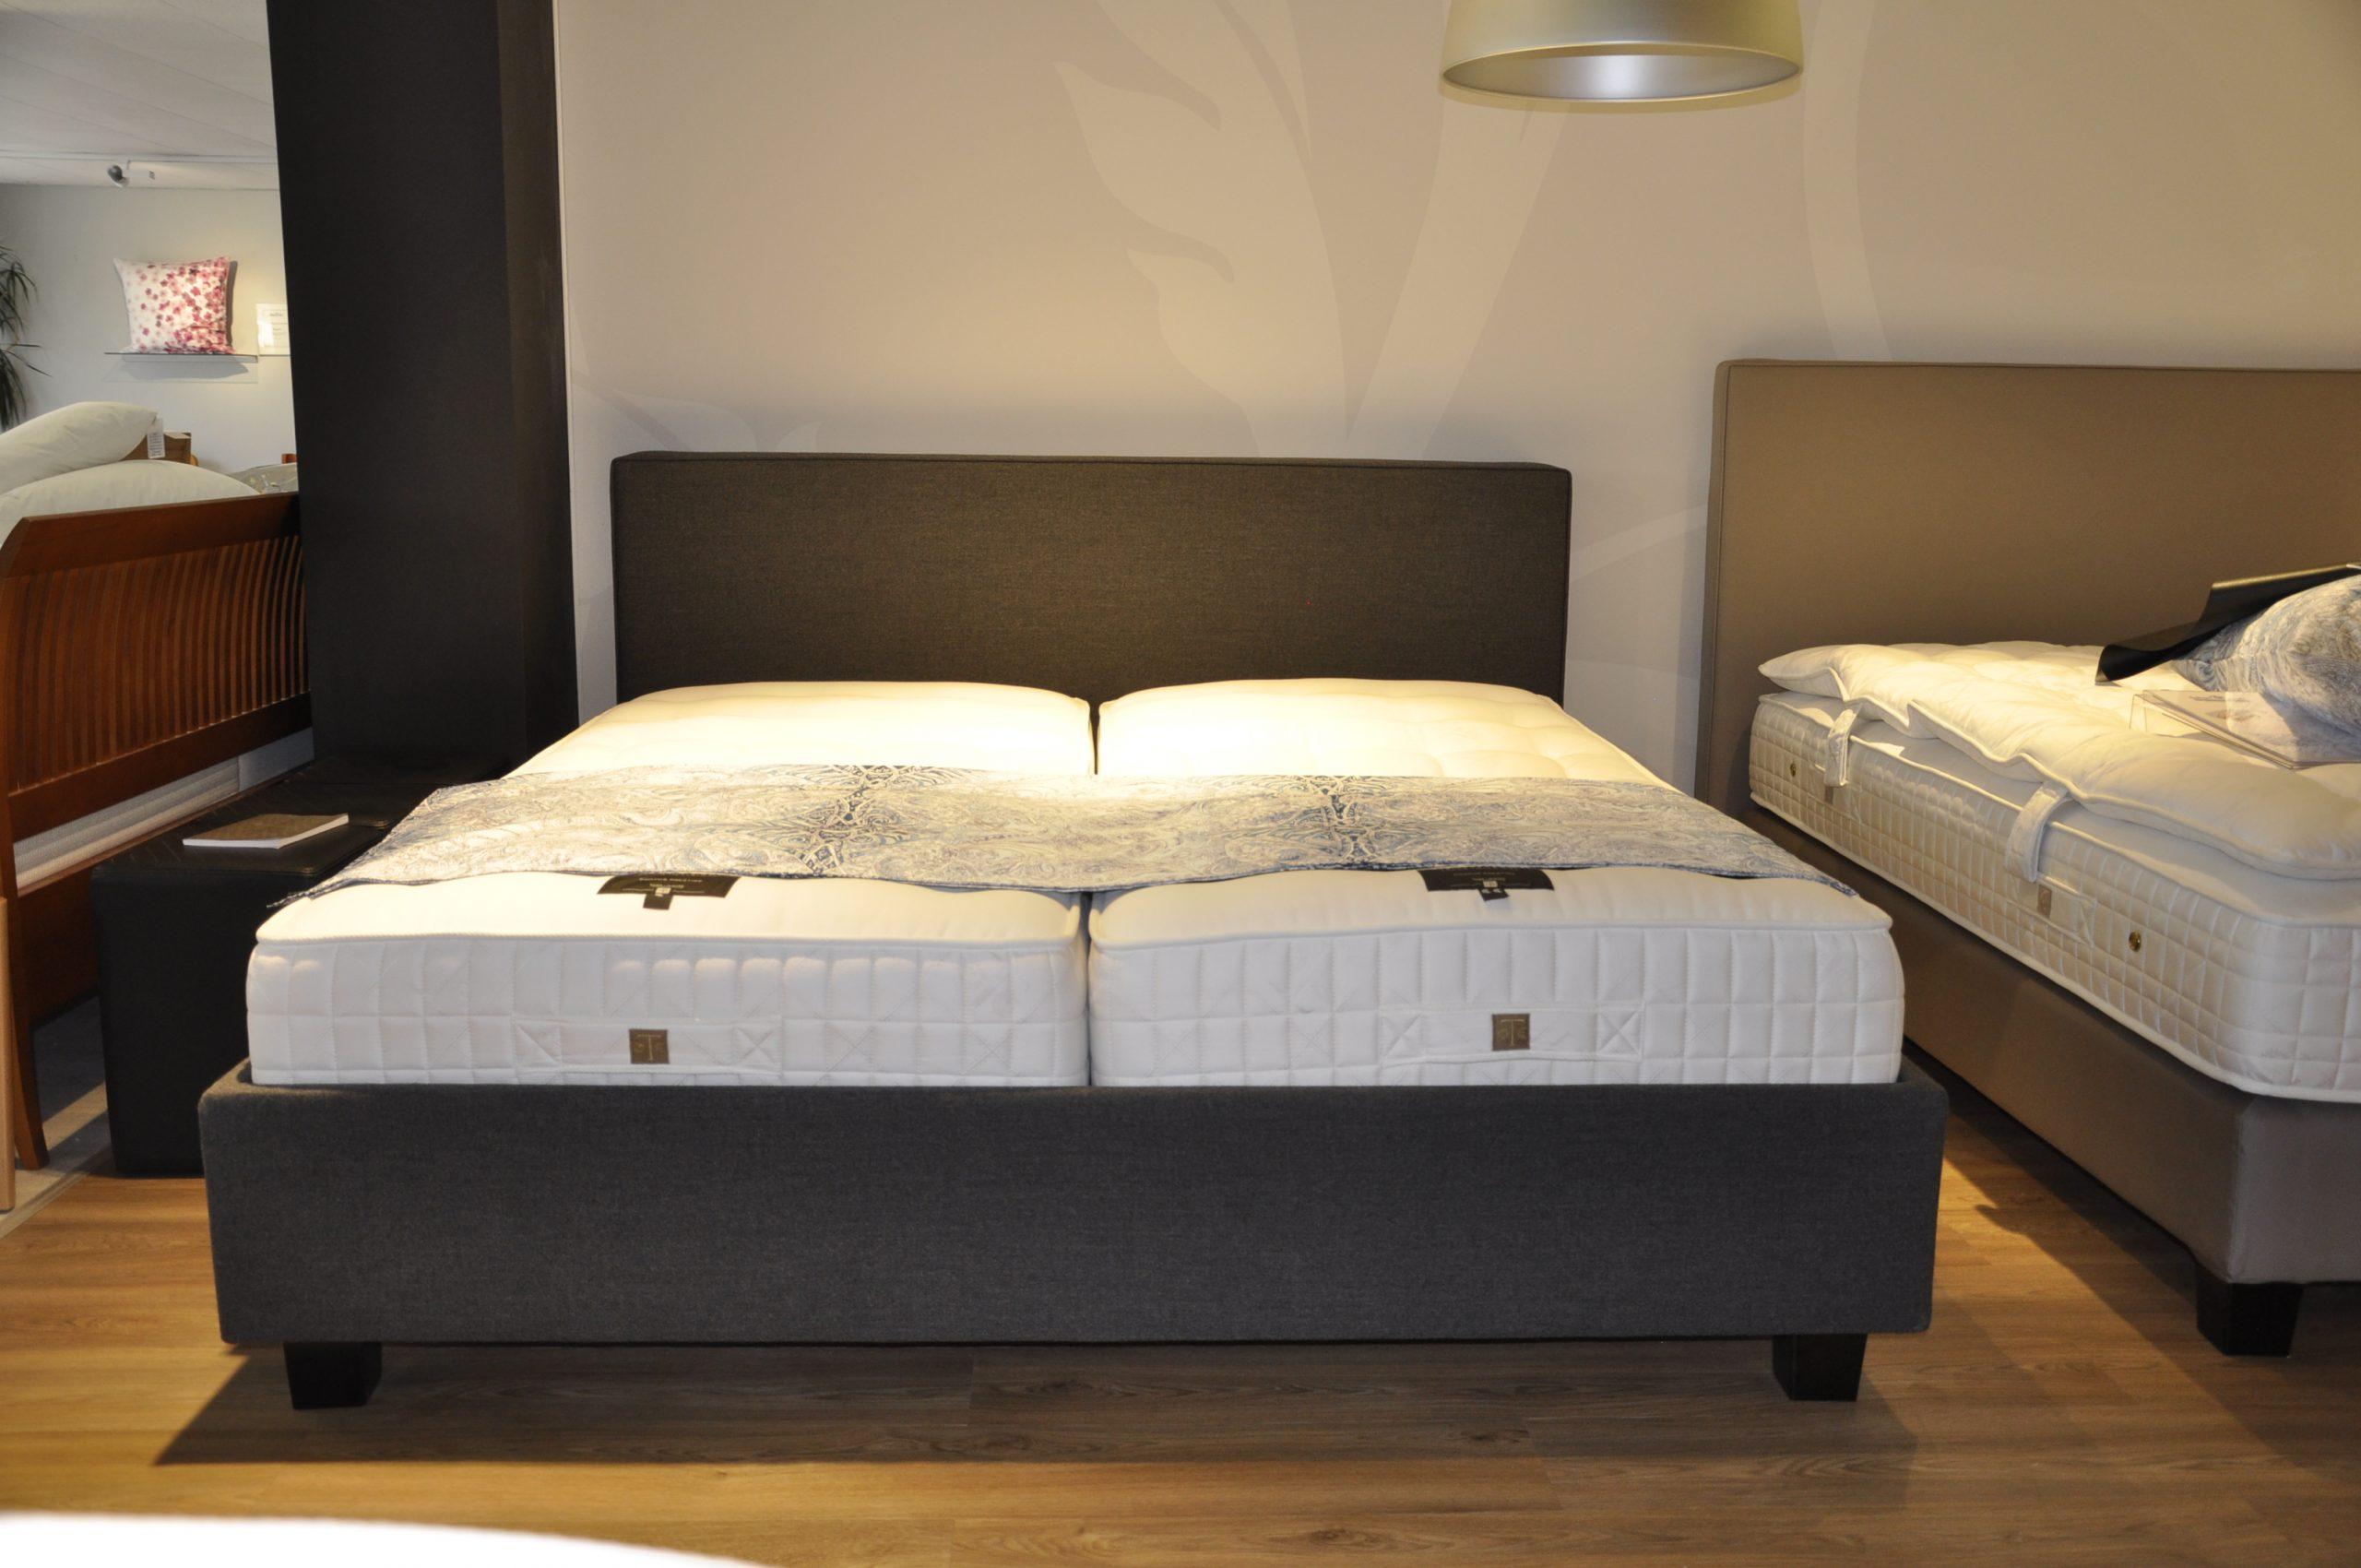 Full Size of Treca Betten Reduzierte Ausstellungsstcke Angebote Sauer 120x200 Garten Lounge Möbel Hohe München Japanische Wohnwert Billerbeck Massivholz Kaufen 140x200 Bett Möbel Boss Betten